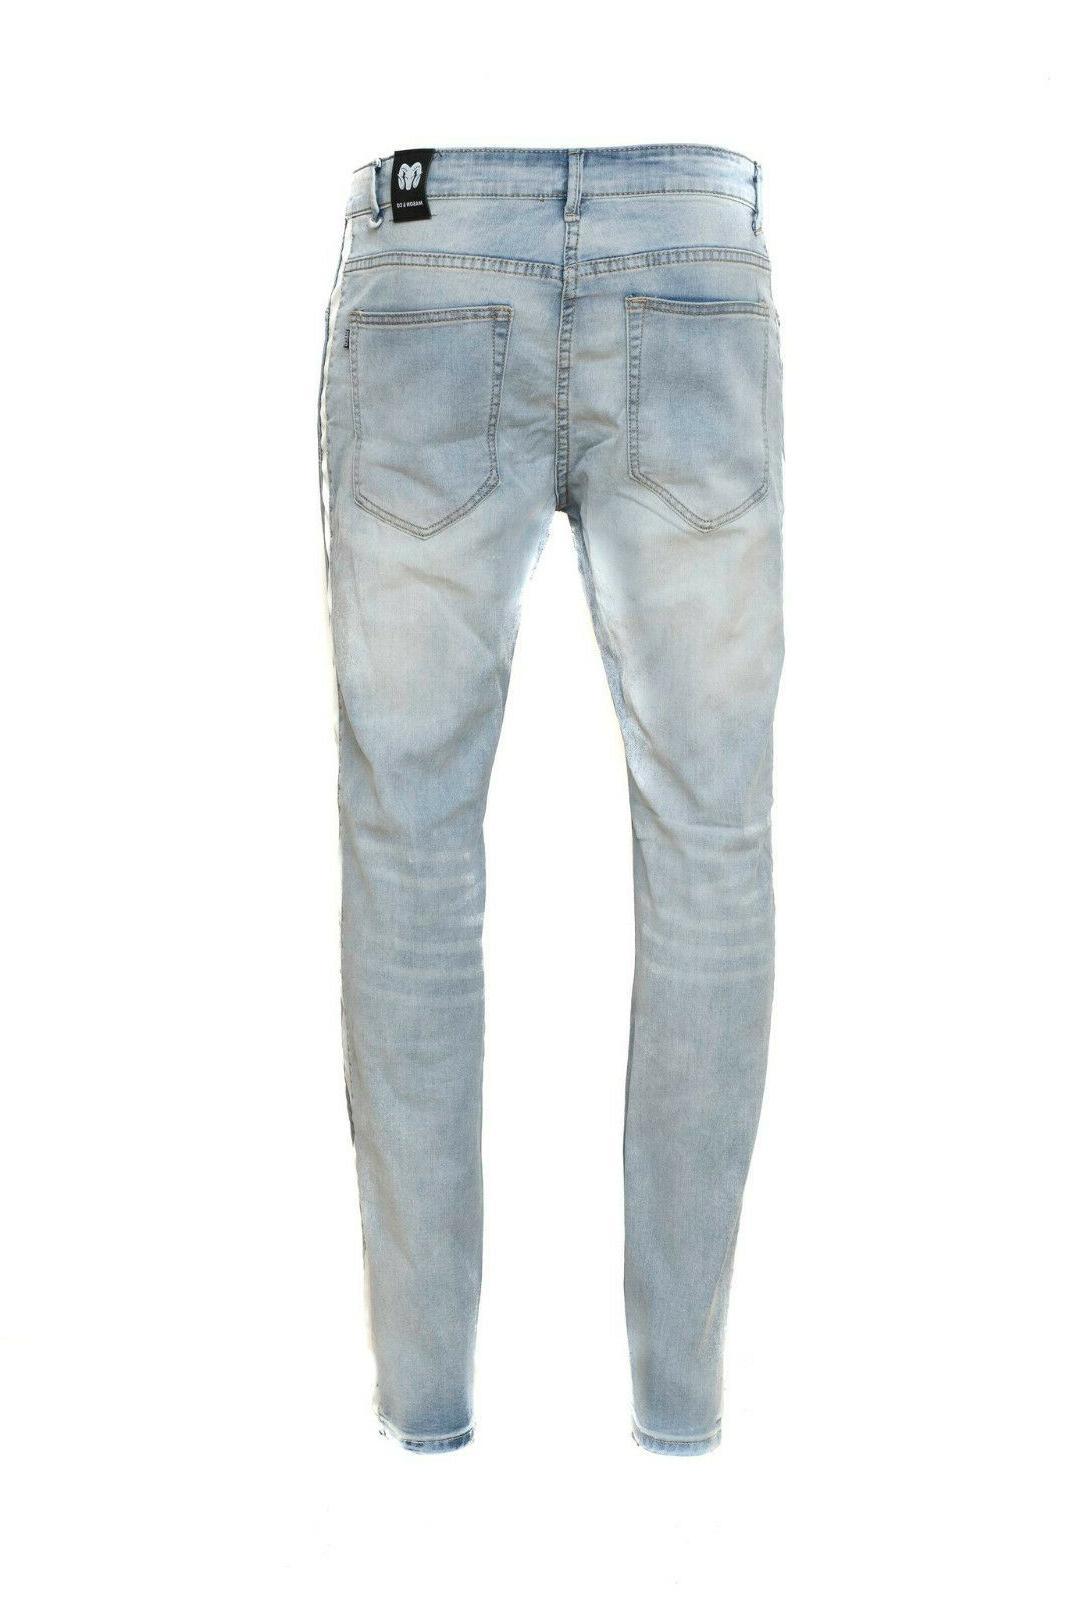 Men's Stretch Fit Denim Jeans